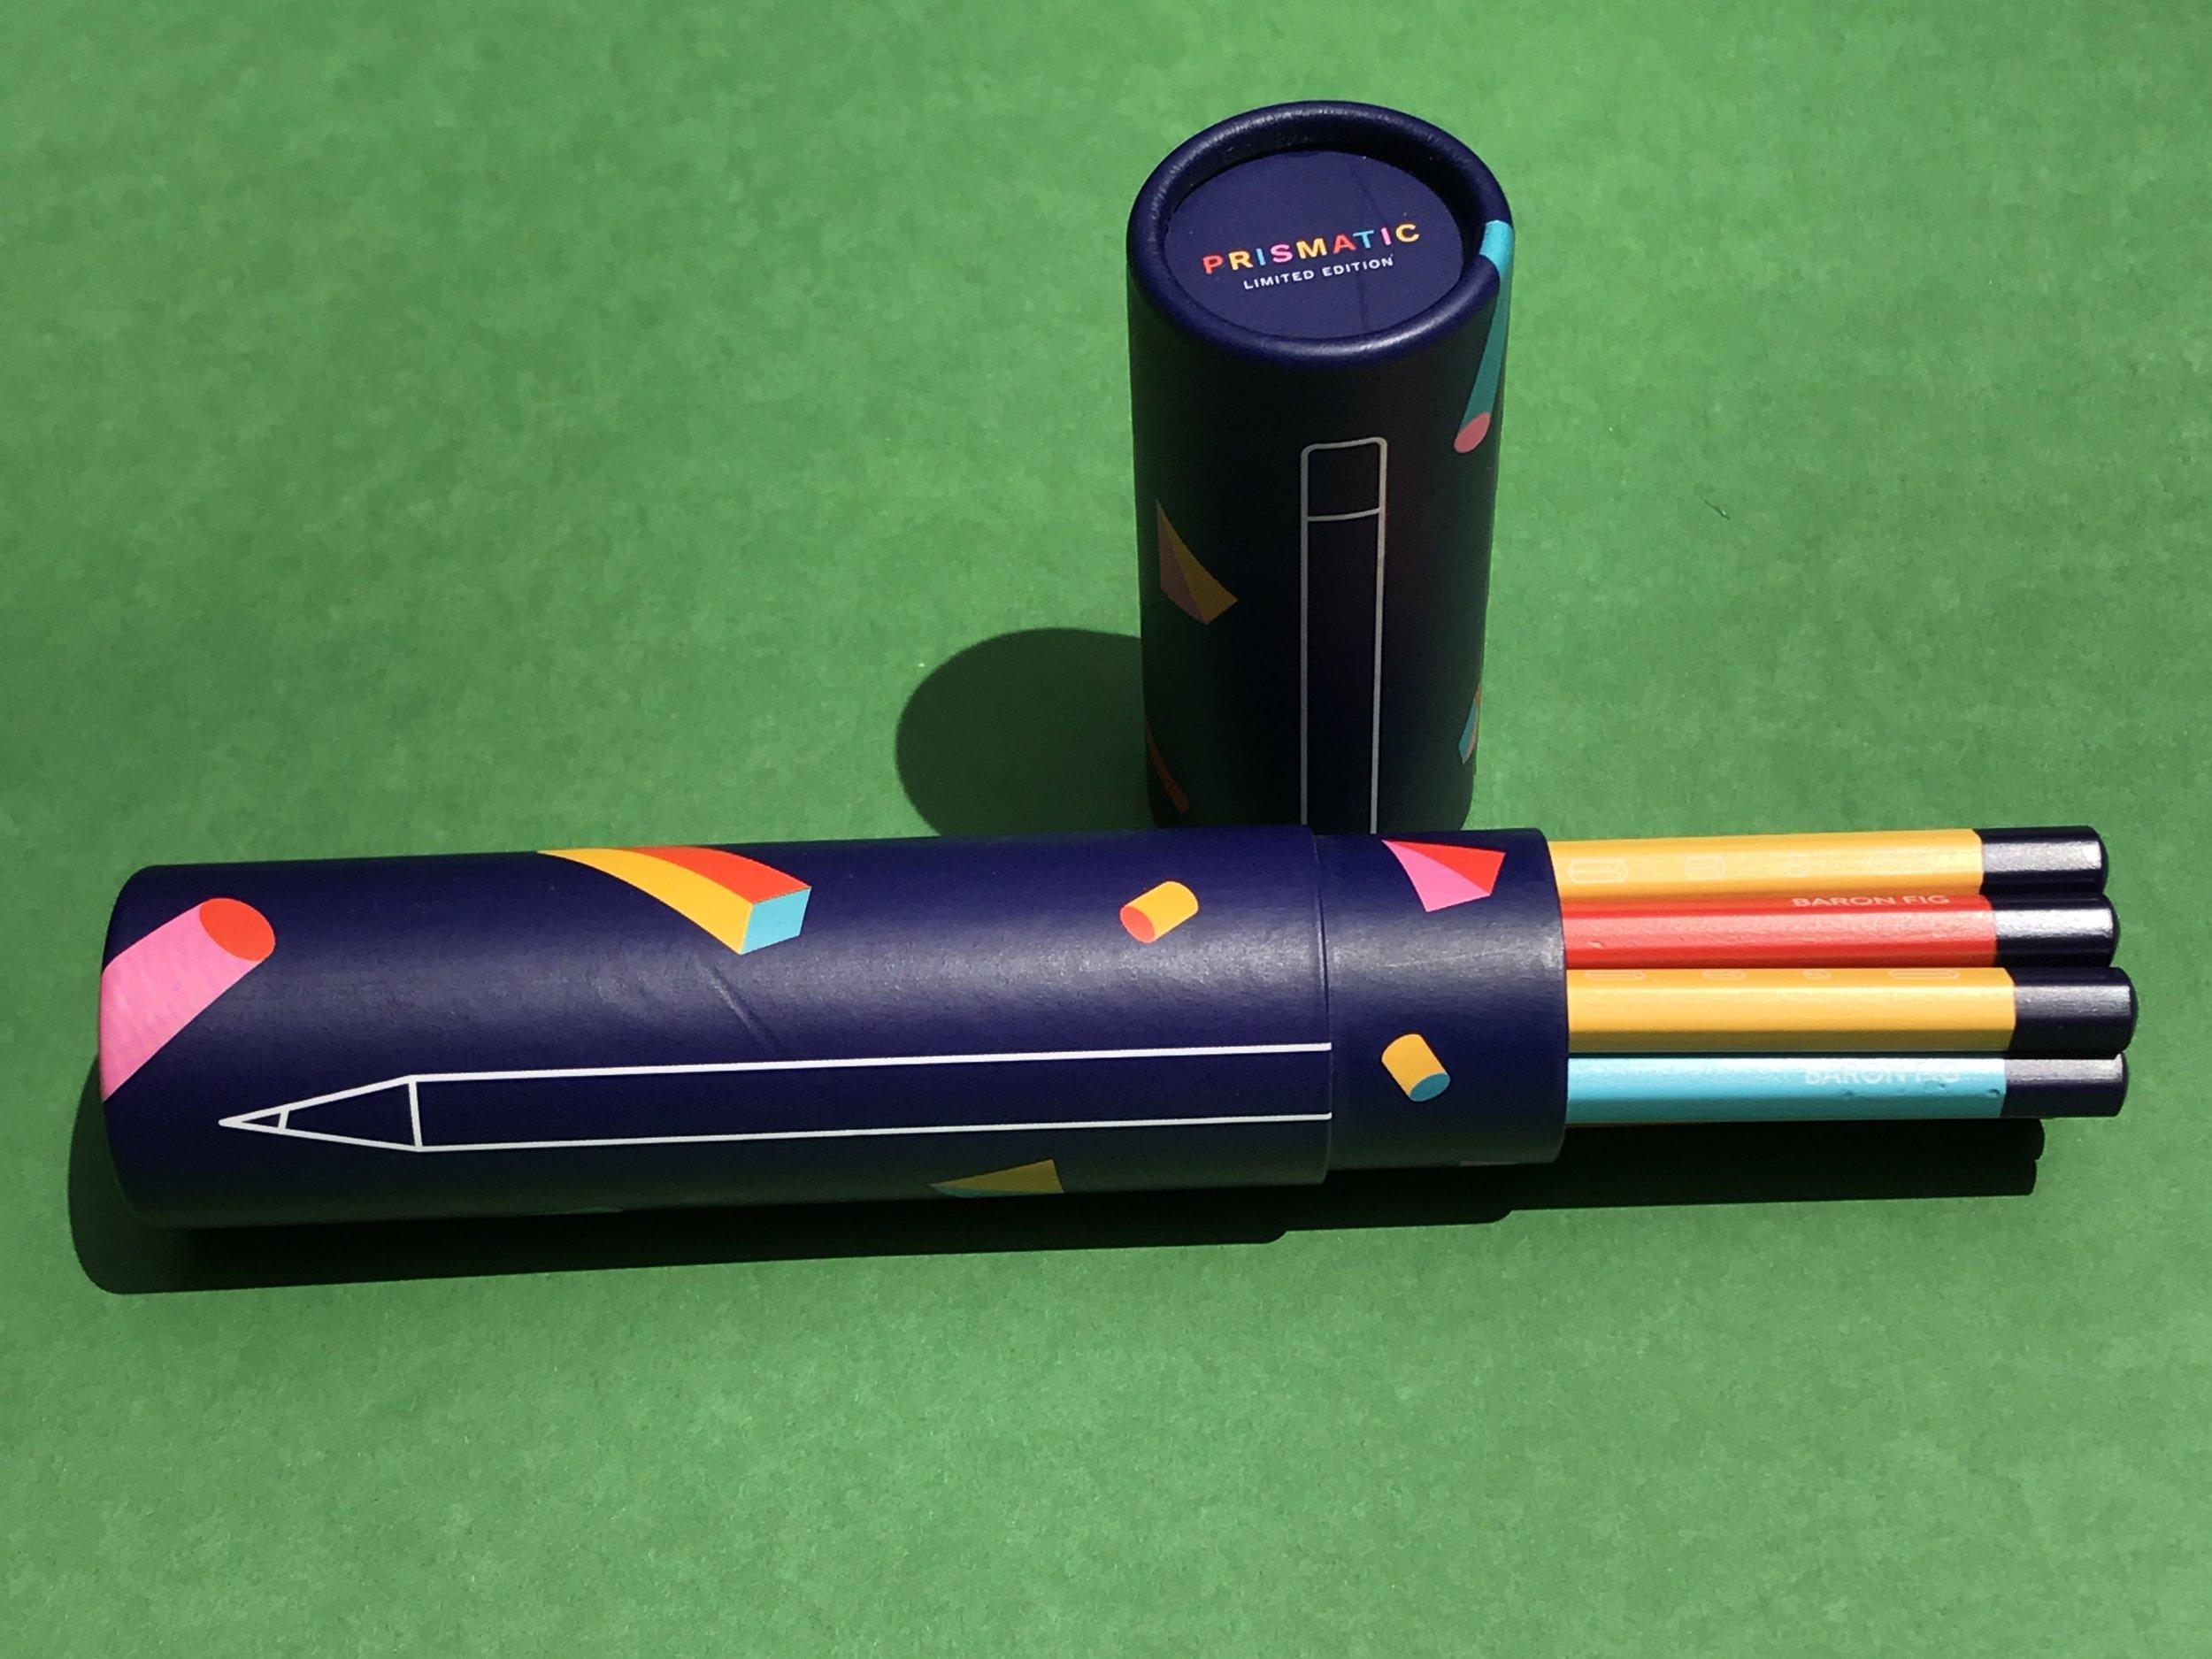 baron-fig-archer-prismatic-pencil.jpg